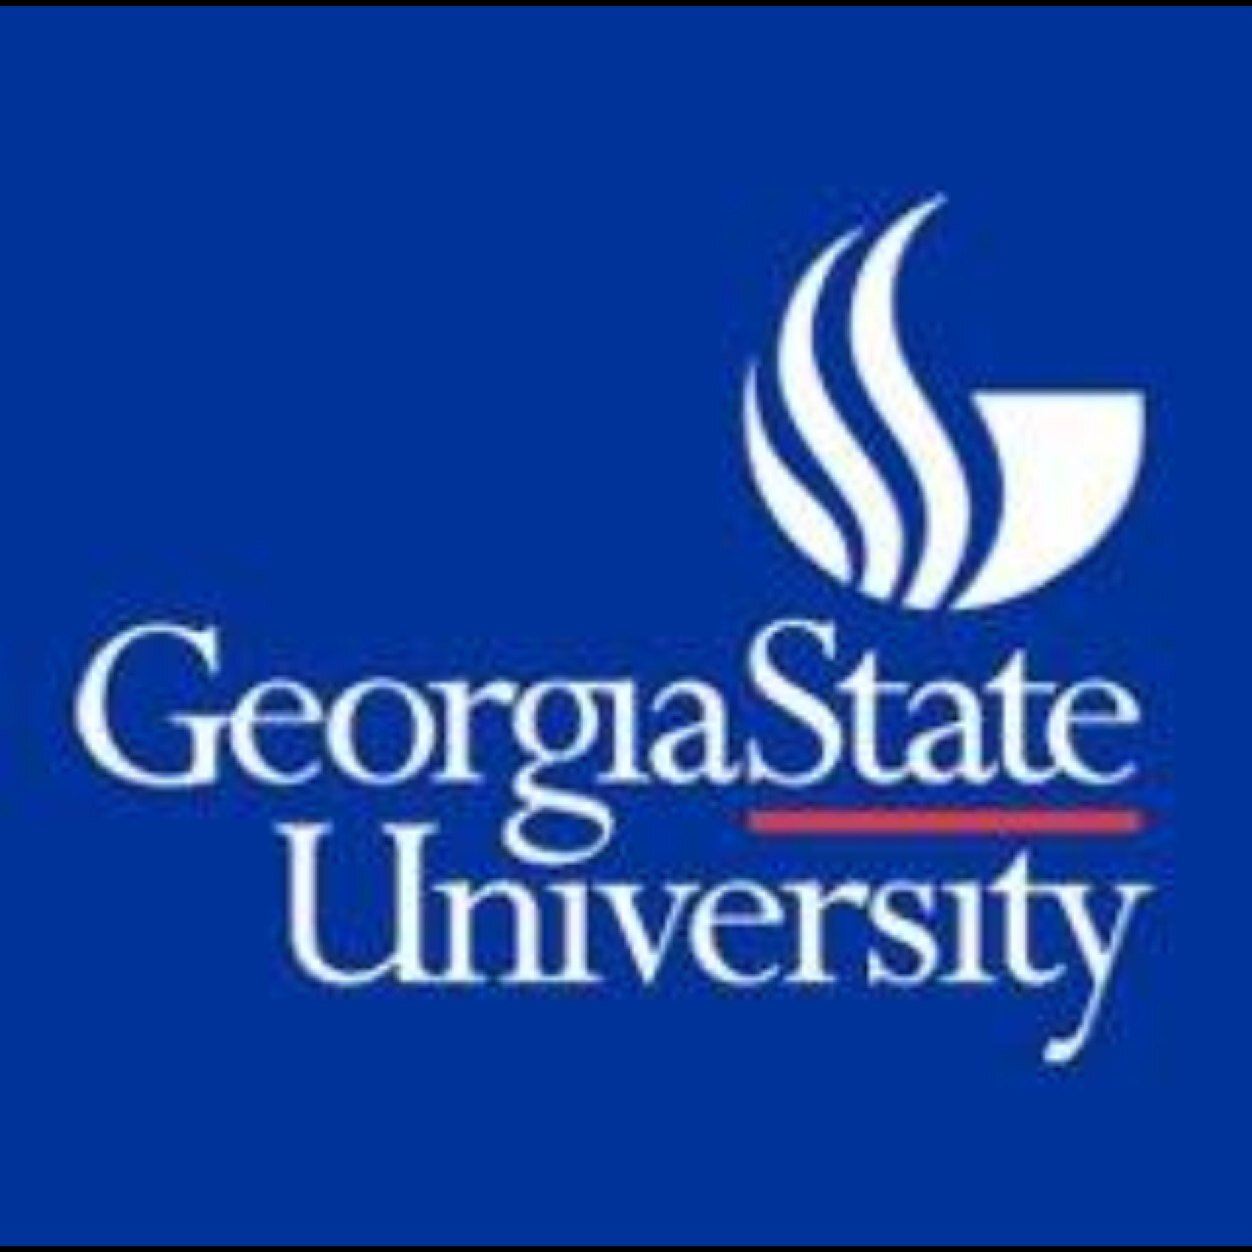 Georgia State University1